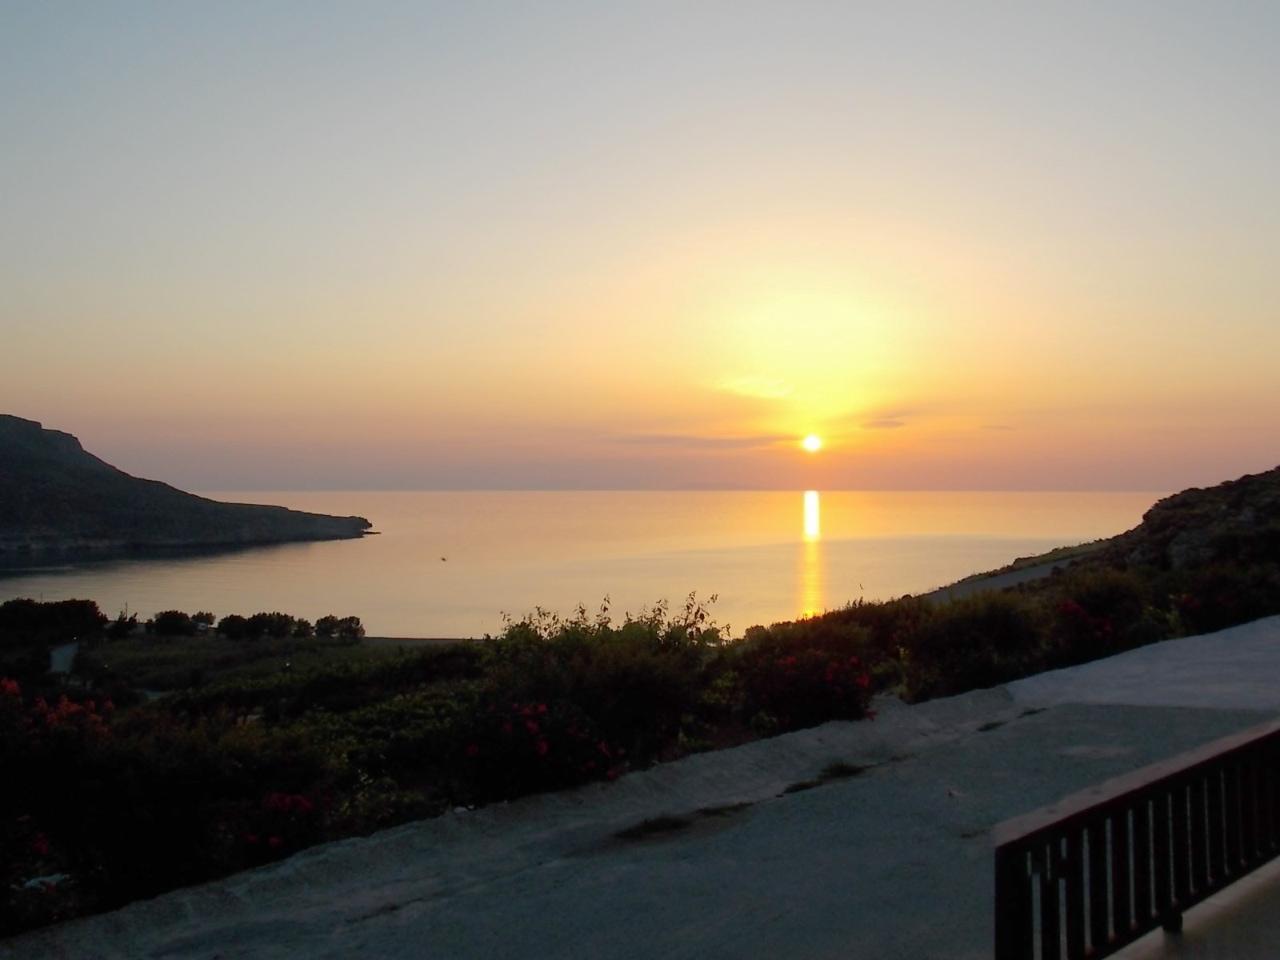 Sunrise at Kato Zakros Village